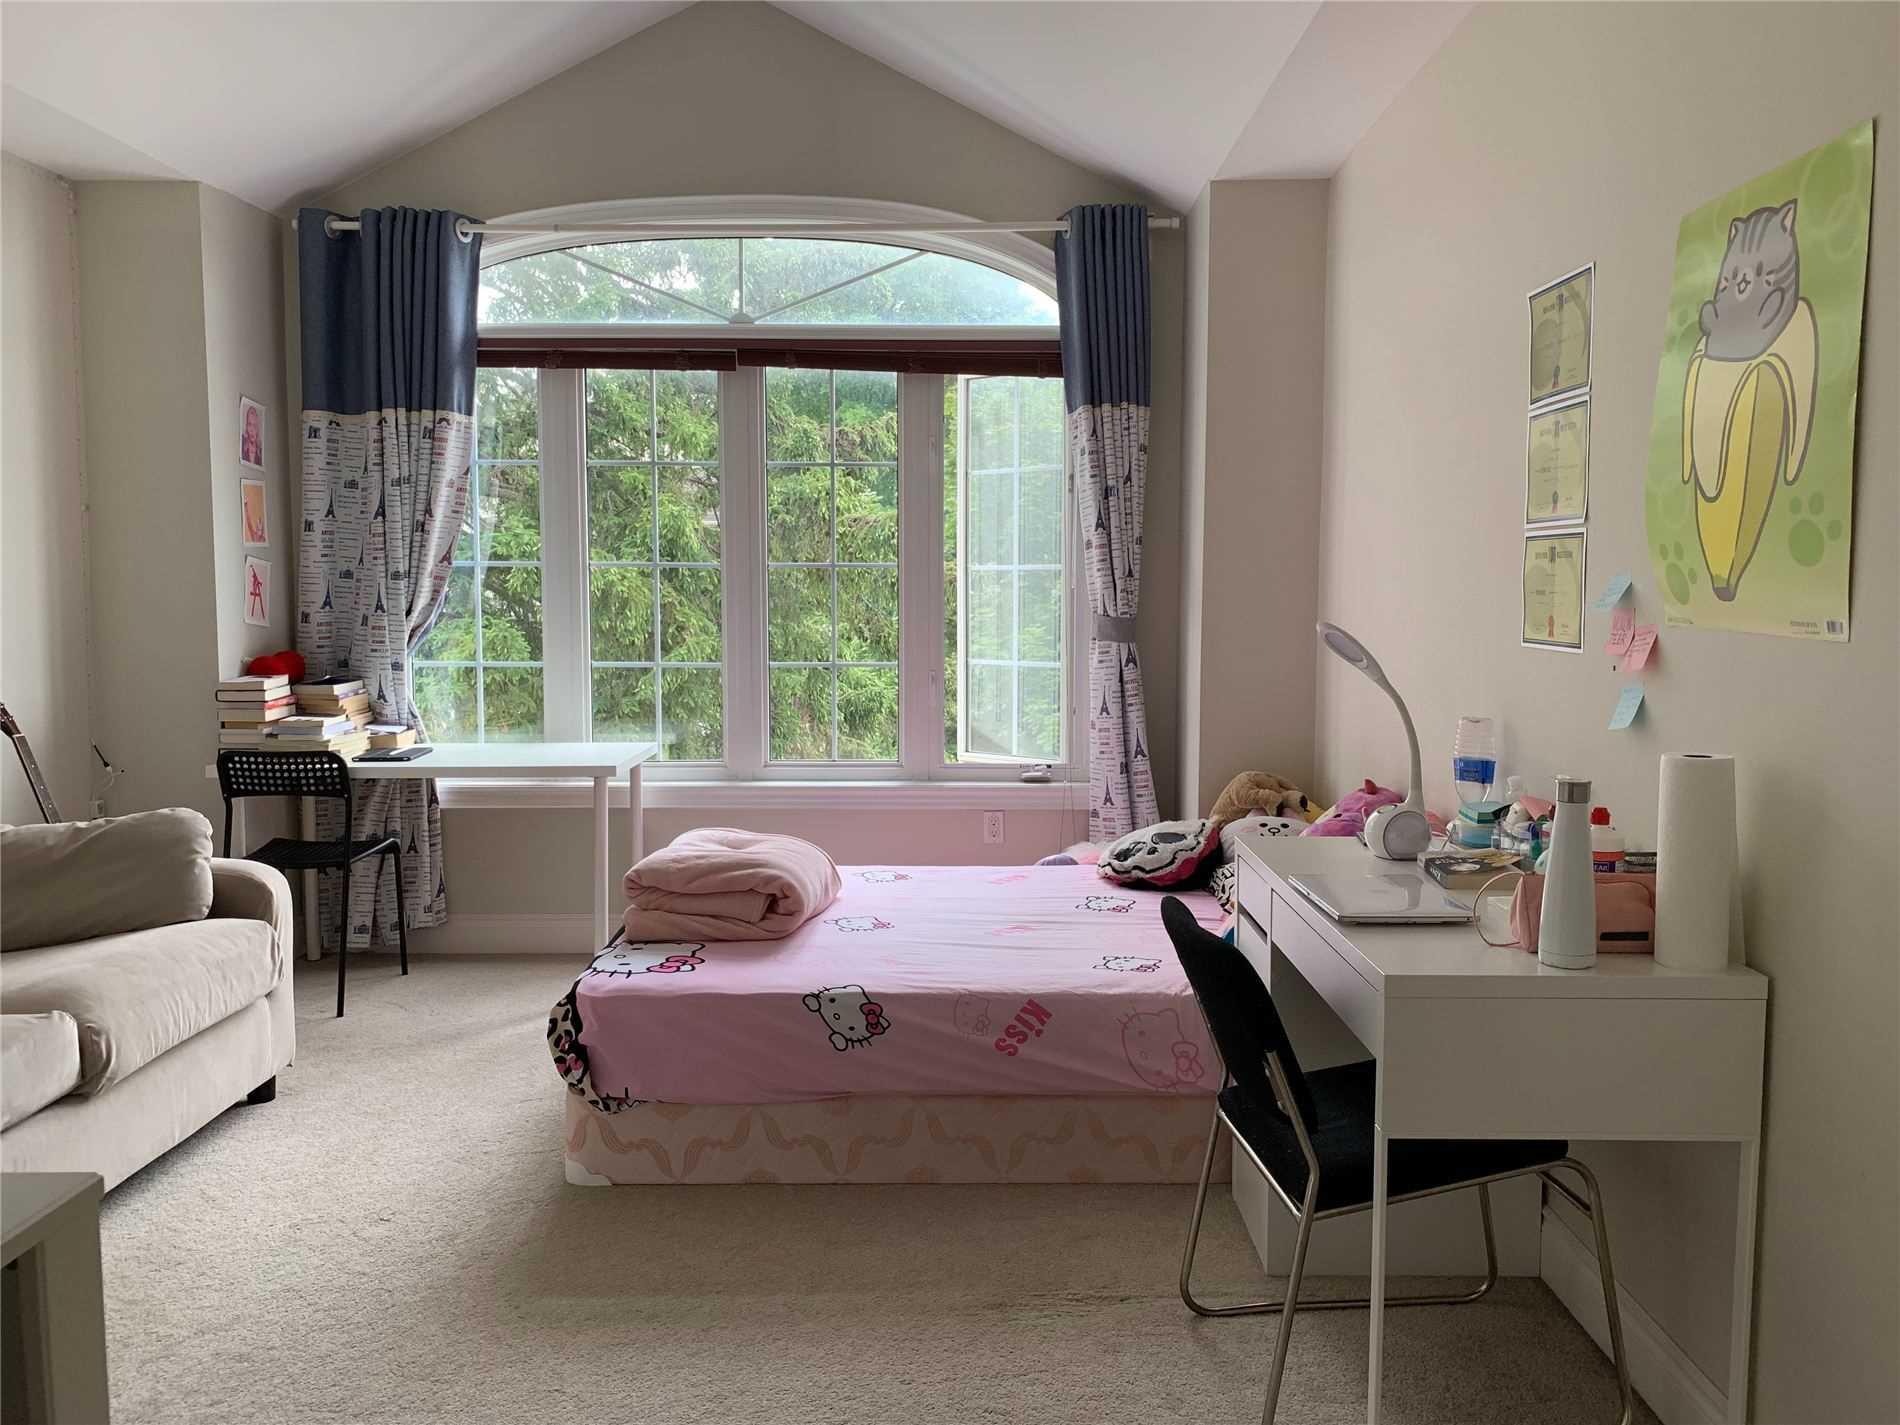 Detached house For Lease In Richmond Hill - 59 Pairash Ave, Richmond Hill, Ontario, Canada L4C0N1 , 4 Bedrooms Bedrooms, ,5 BathroomsBathrooms,Detached,For Lease,Pairash